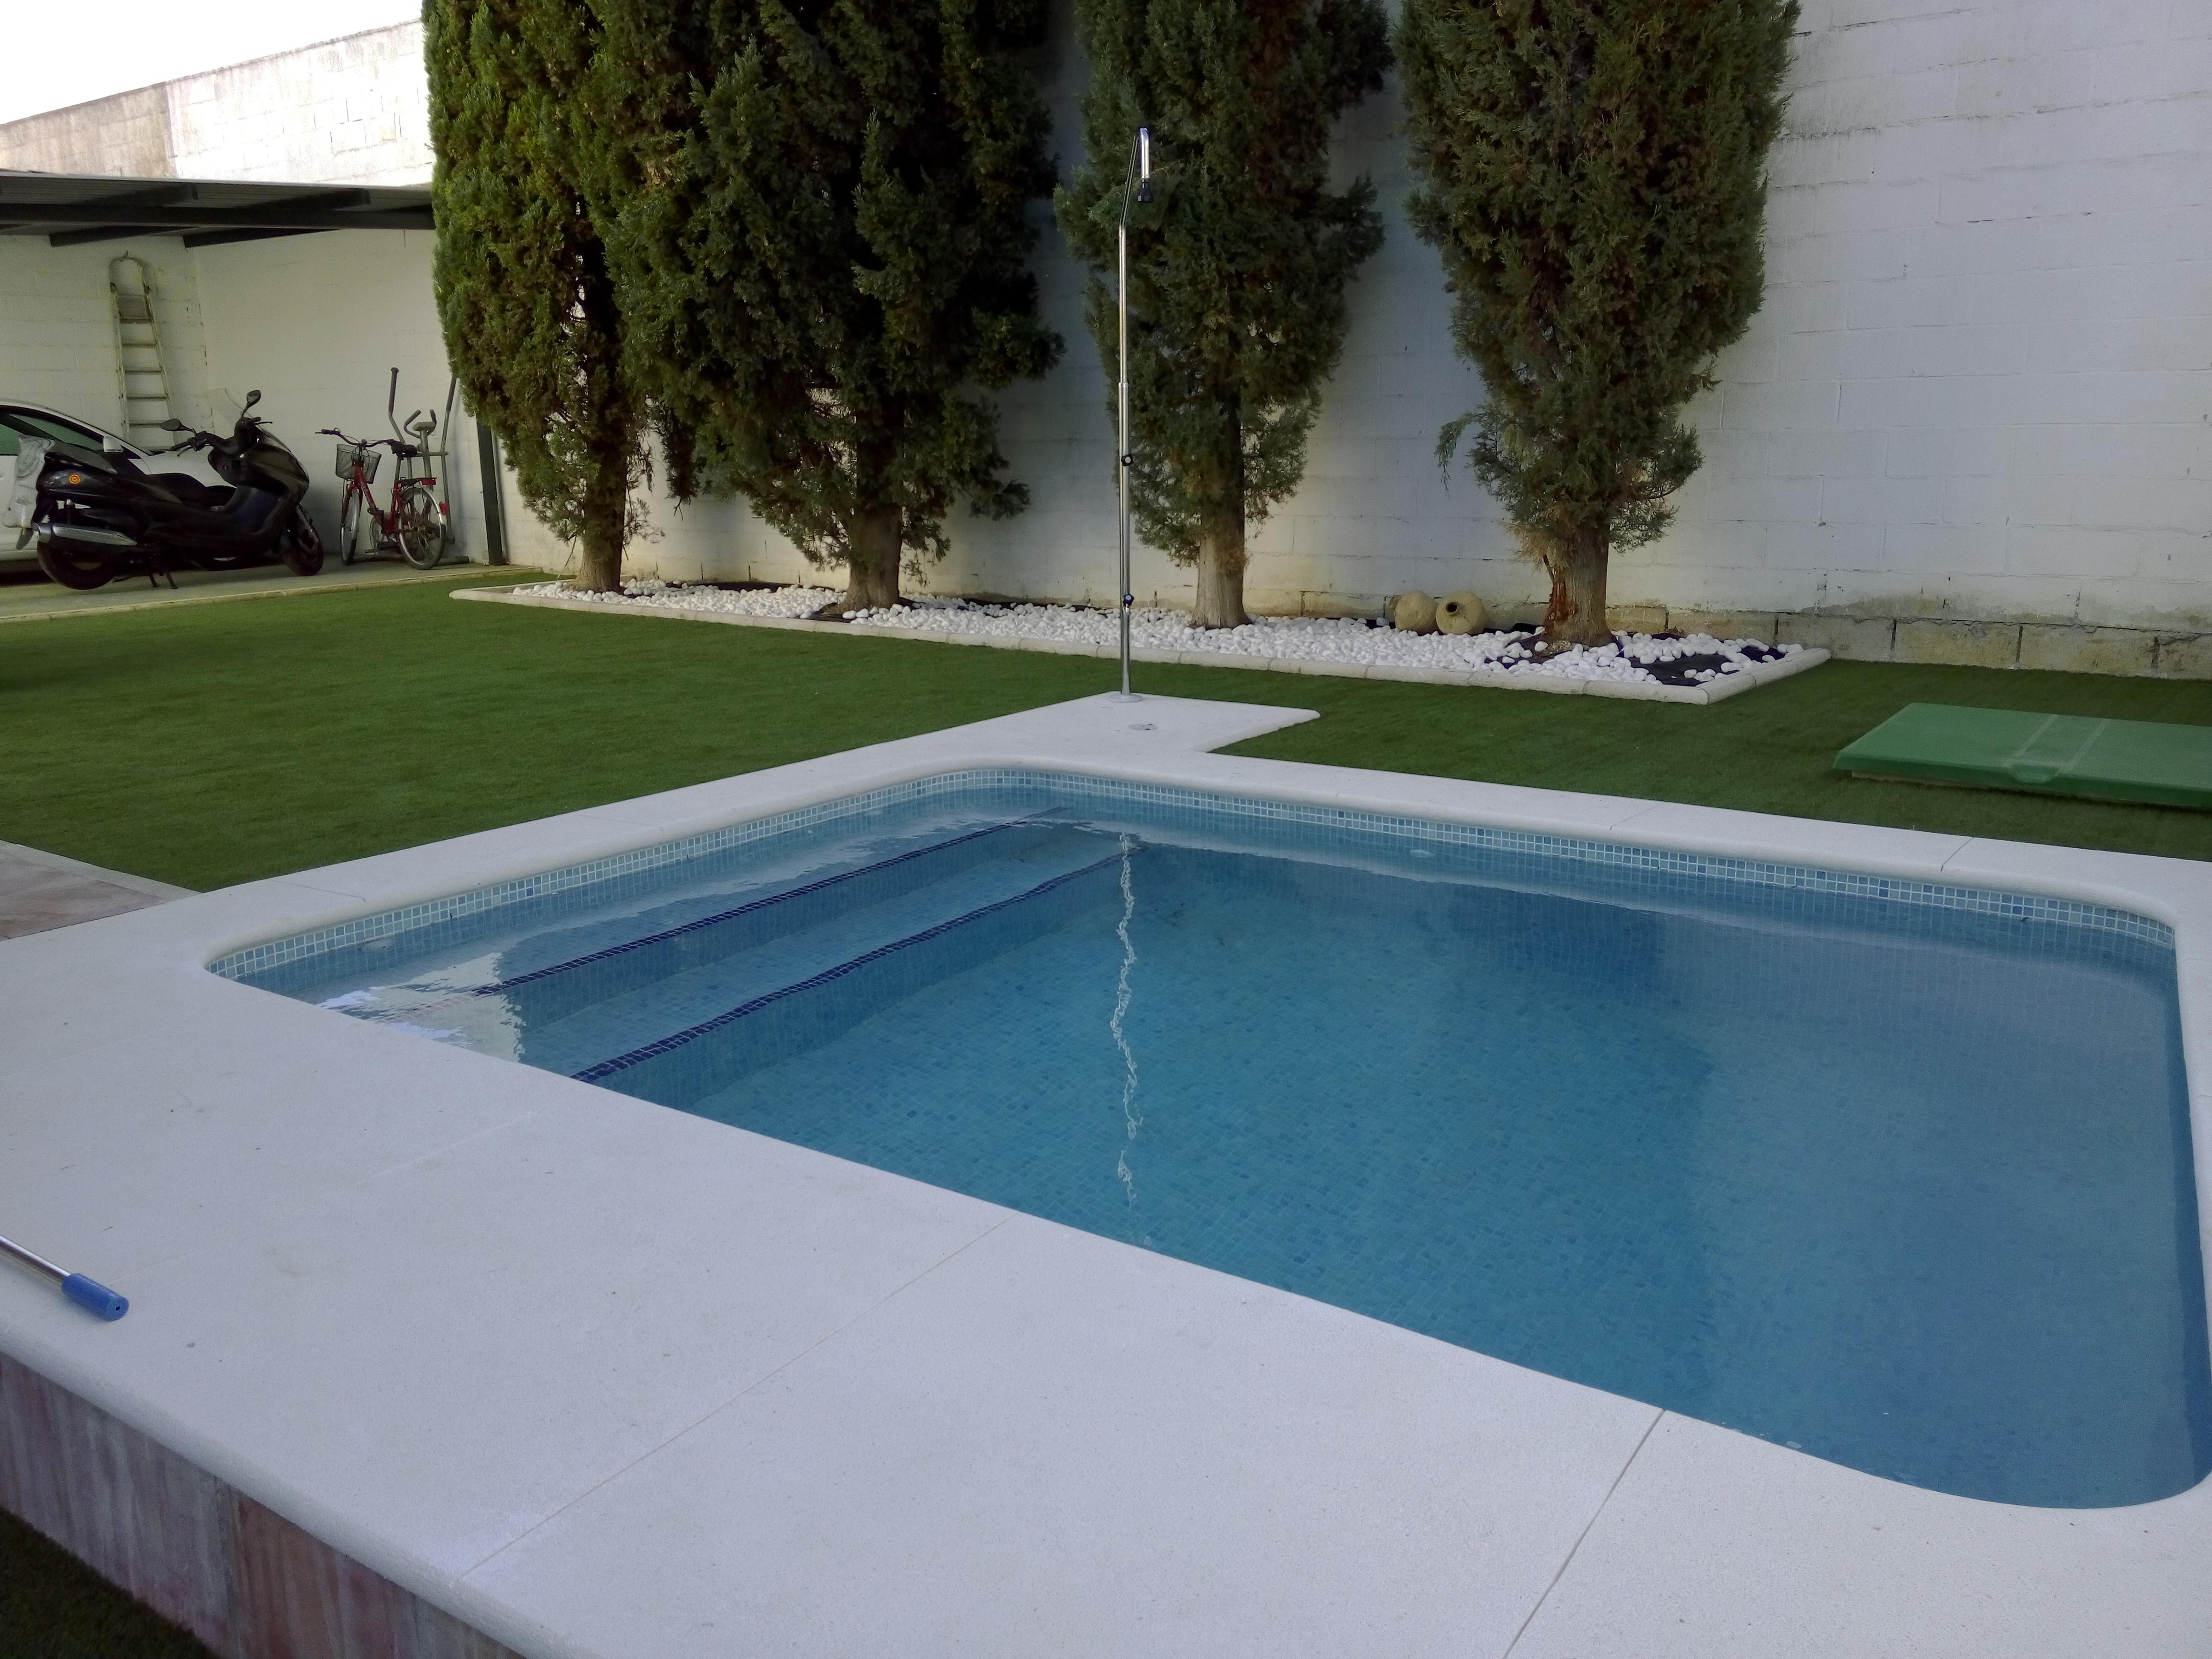 Piscinas privadas construcci n de piscinas for Piscinas particulares